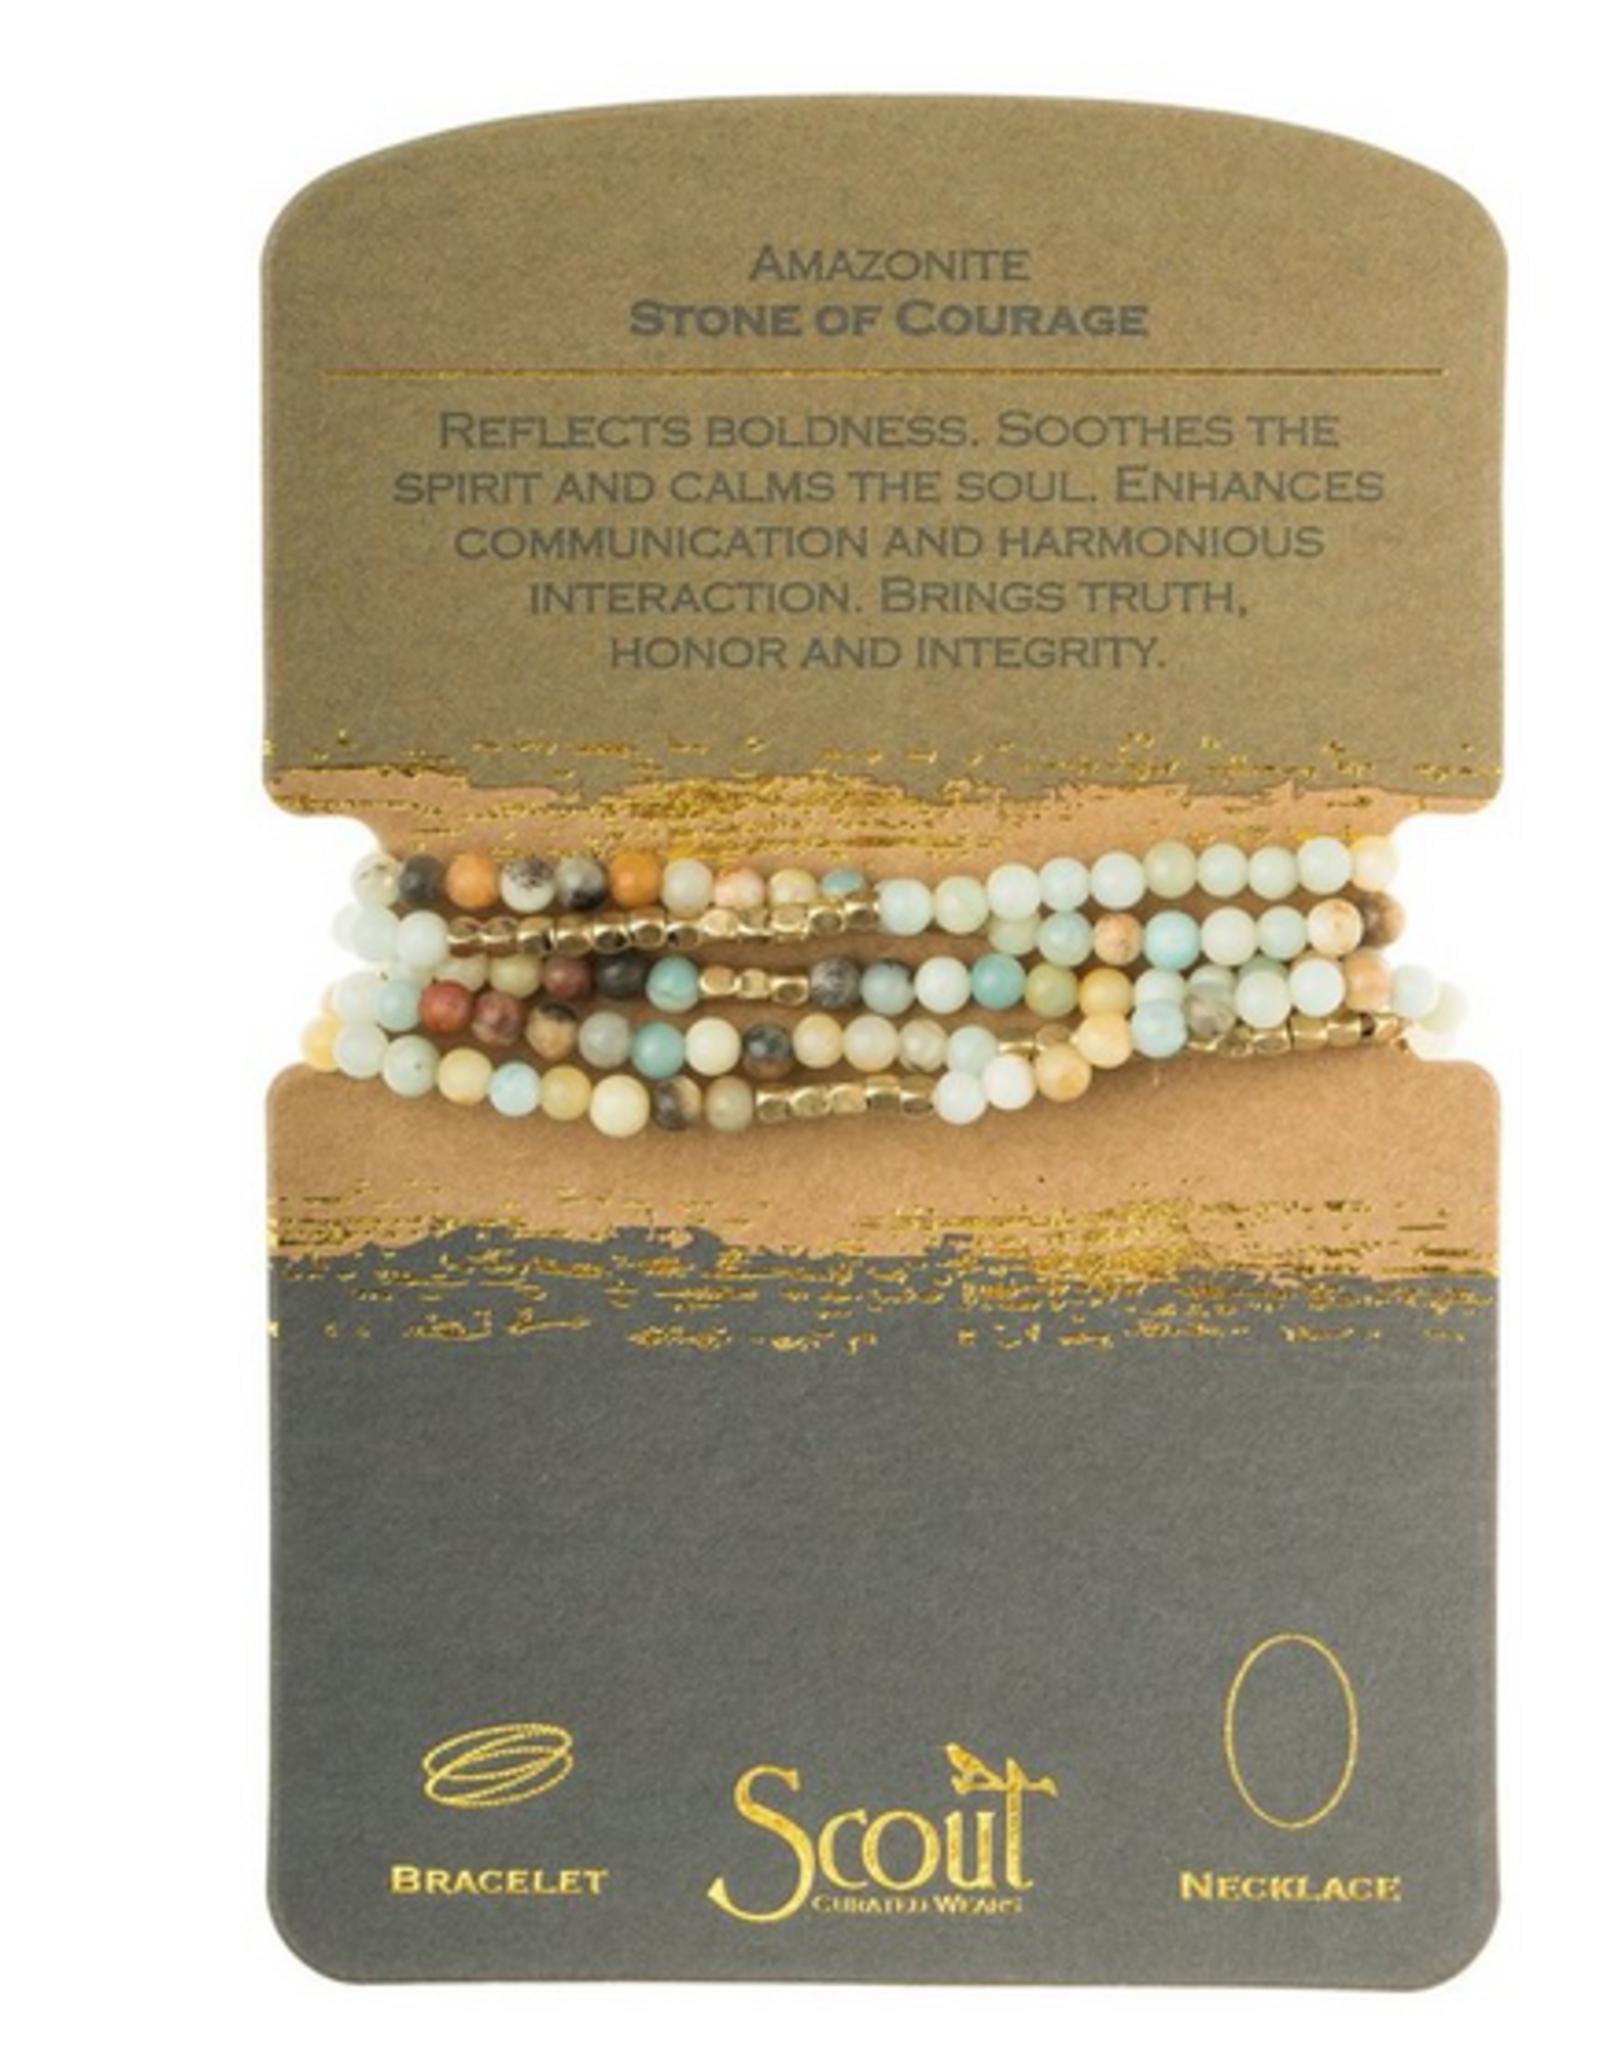 Scout Wrap Amazonite